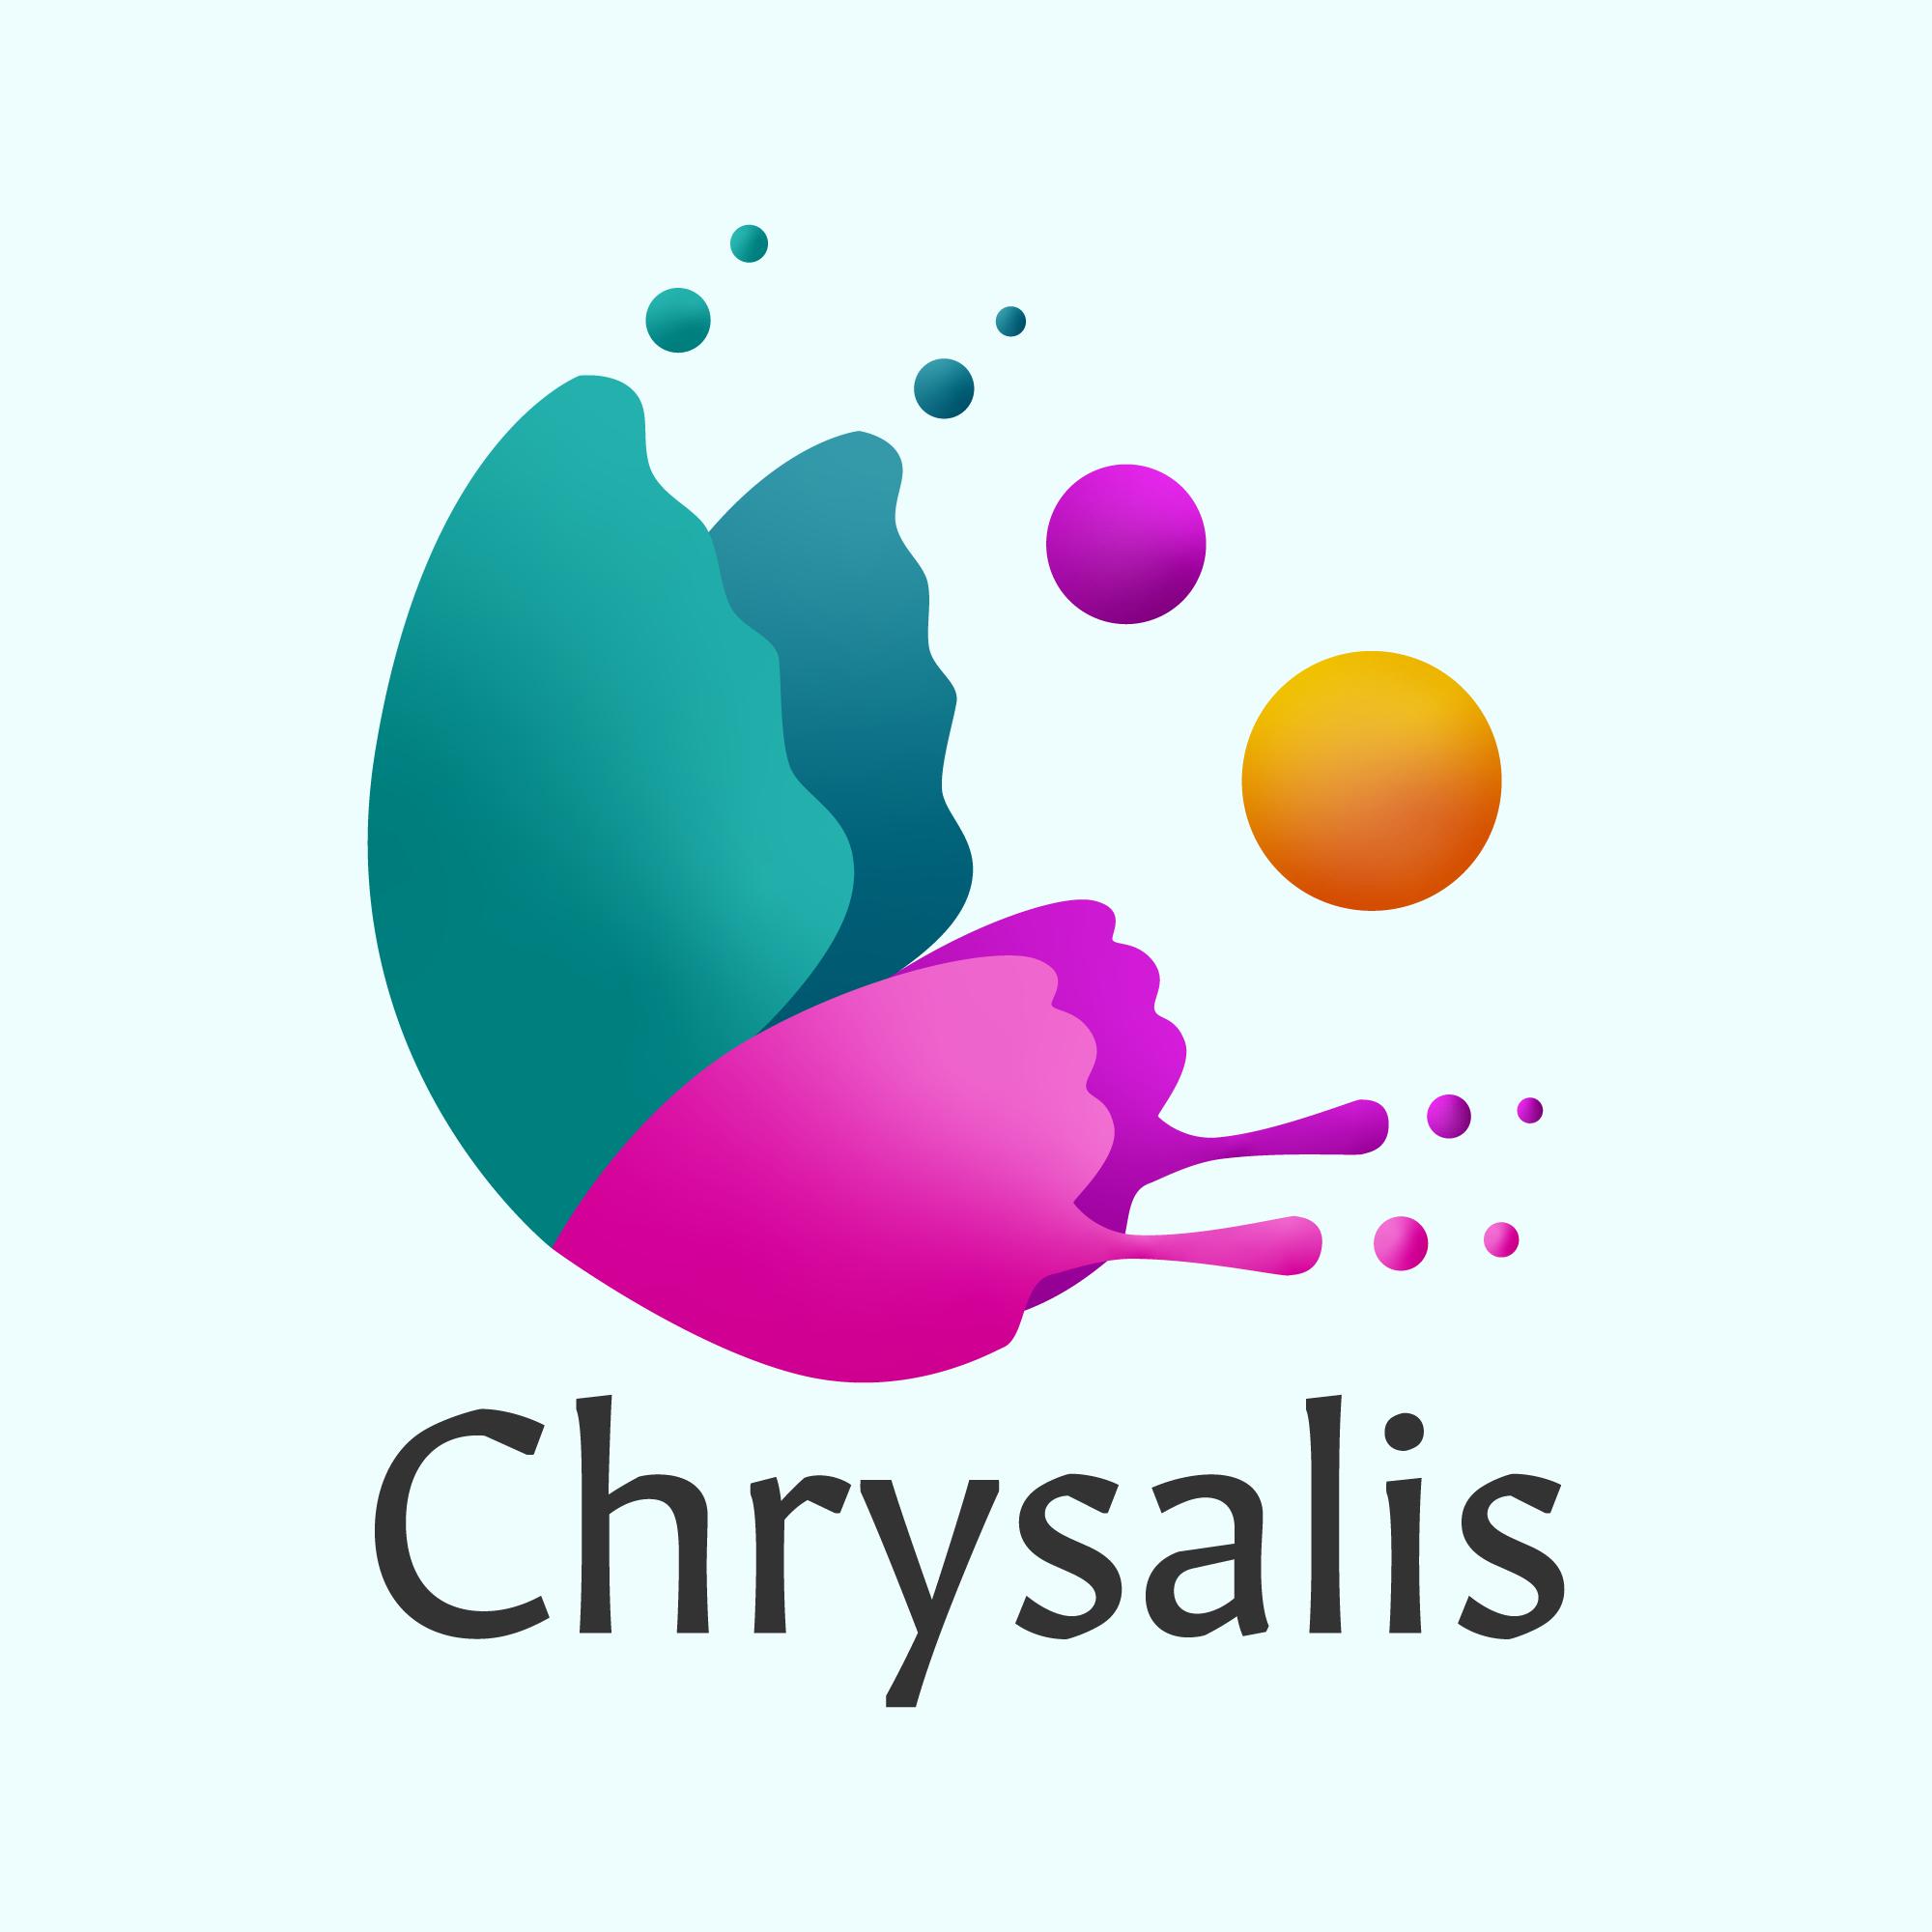 Chrysalis-2000x2000